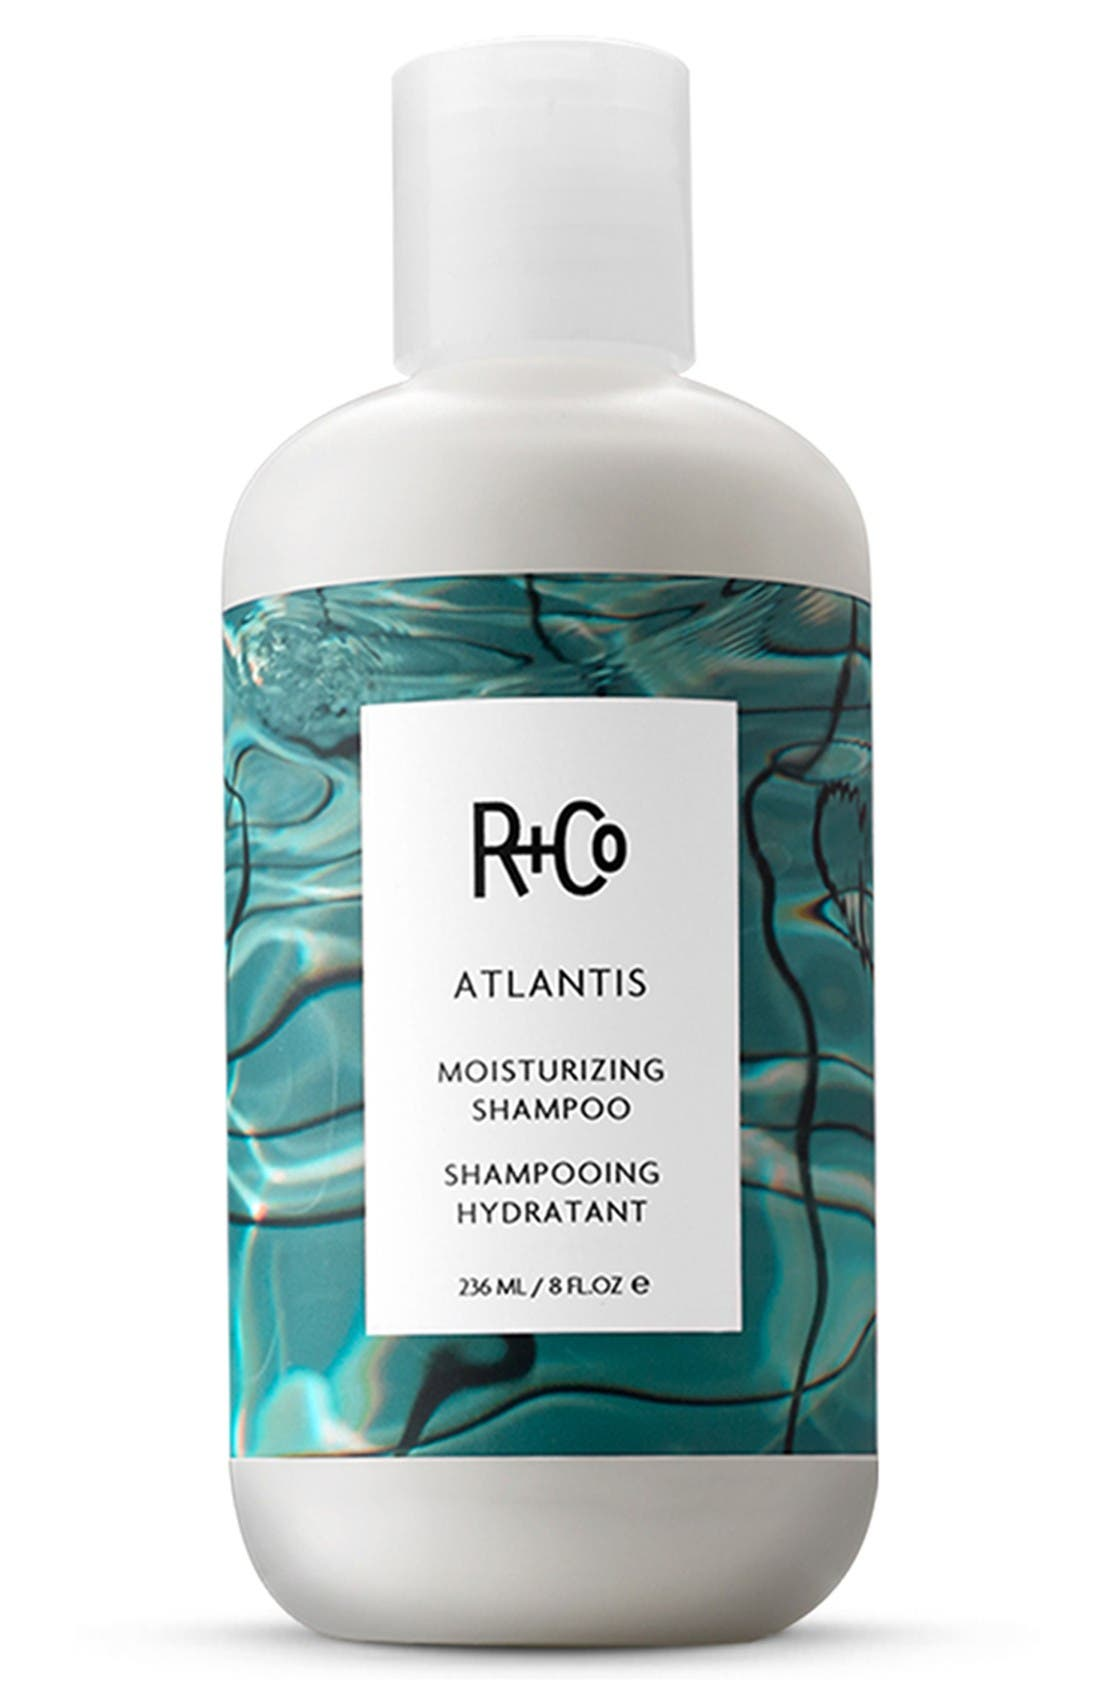 Alternate Image 1 Selected - SPACE.NK.apothecary R+Co Atlantis Moisturizing Shampoo